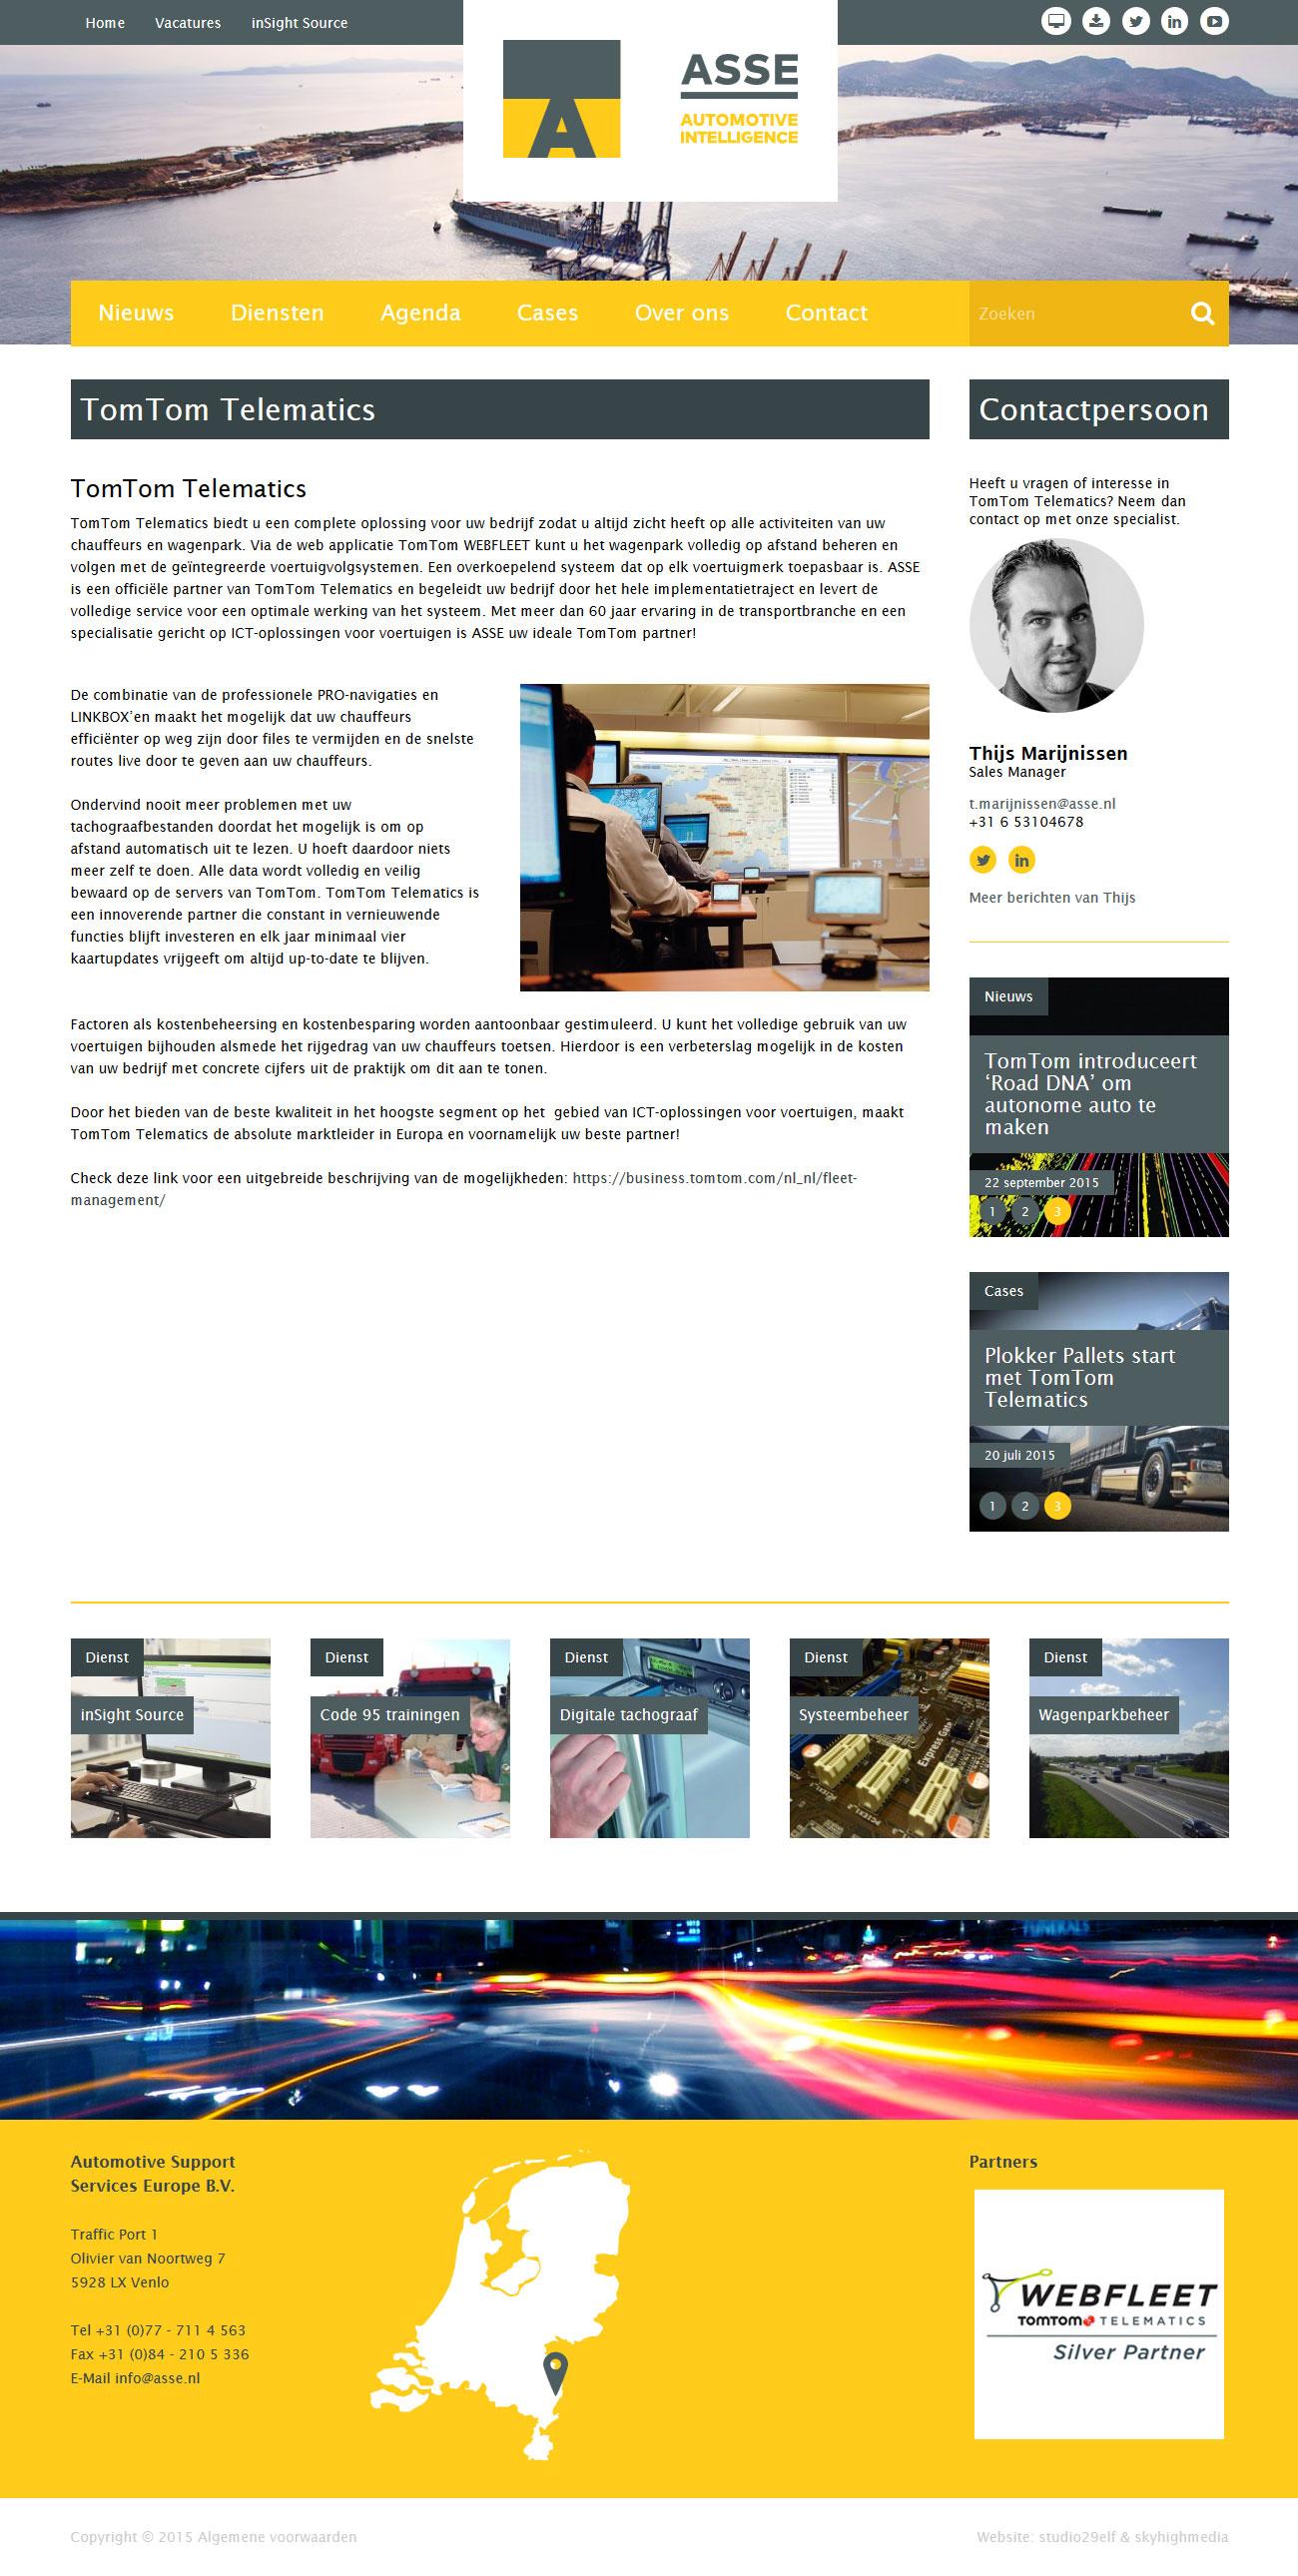 asse_website2